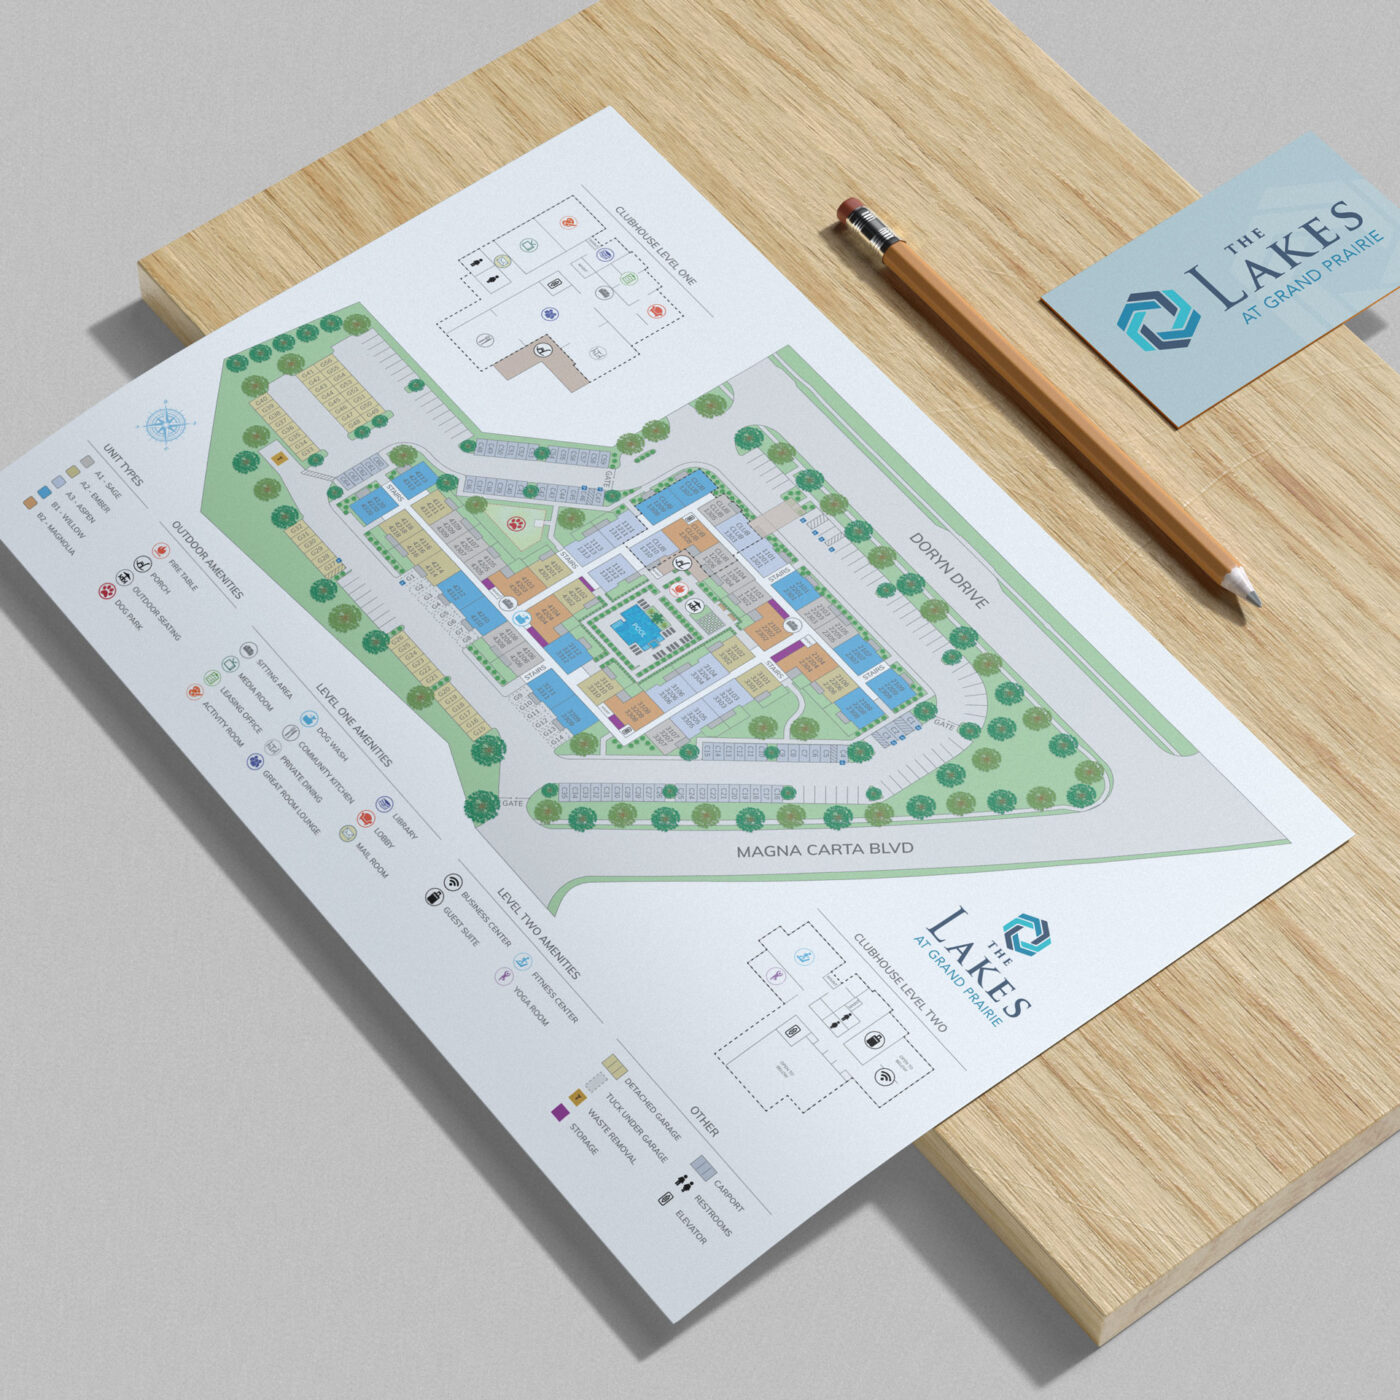 property sitemap design